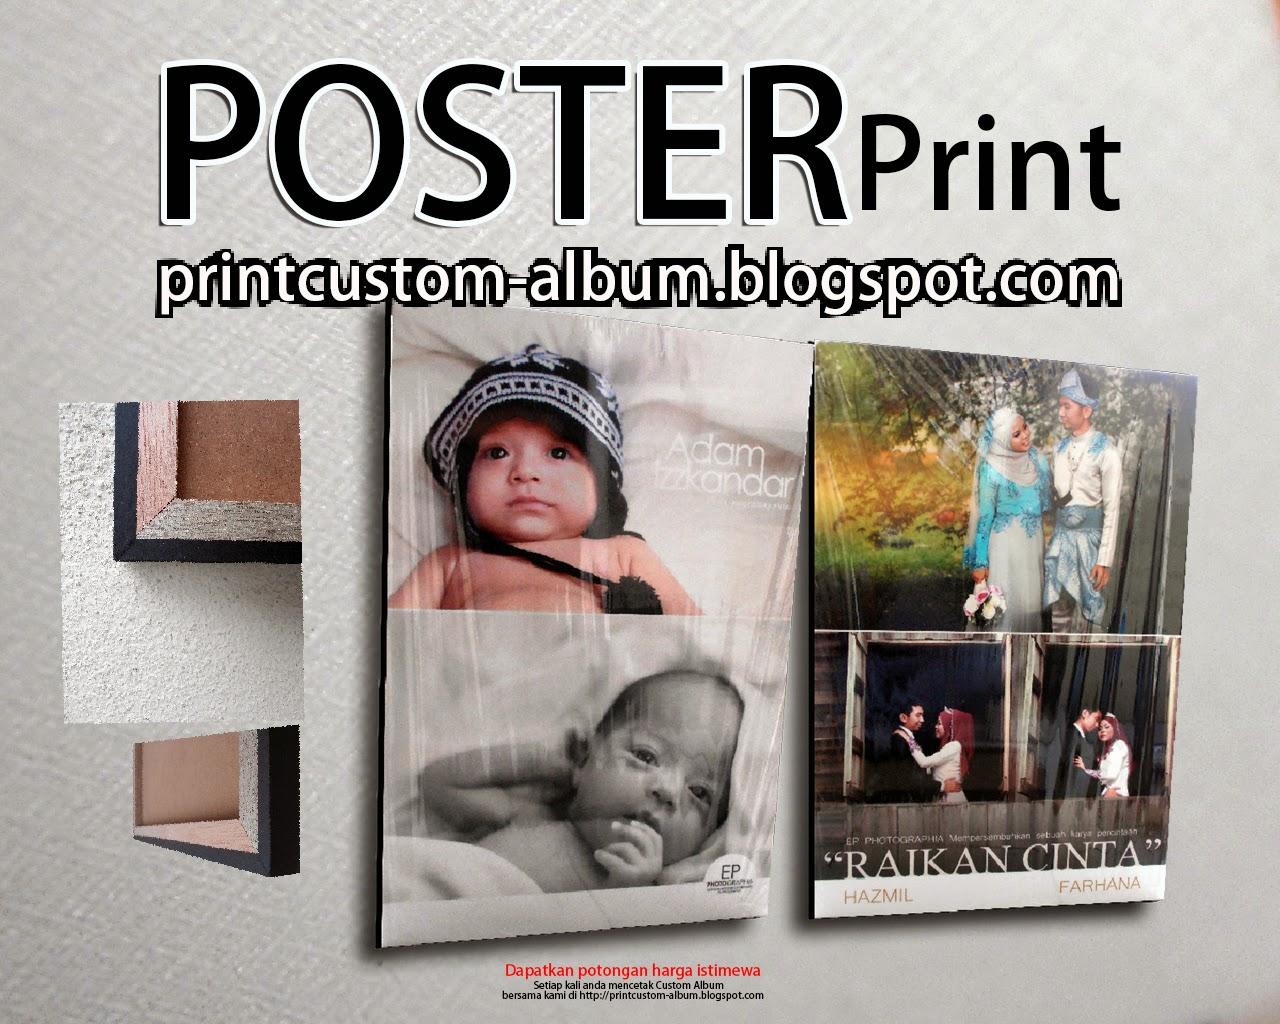 poster printing,wall poster,advertising poster,tempat buat poster,tempahan poster